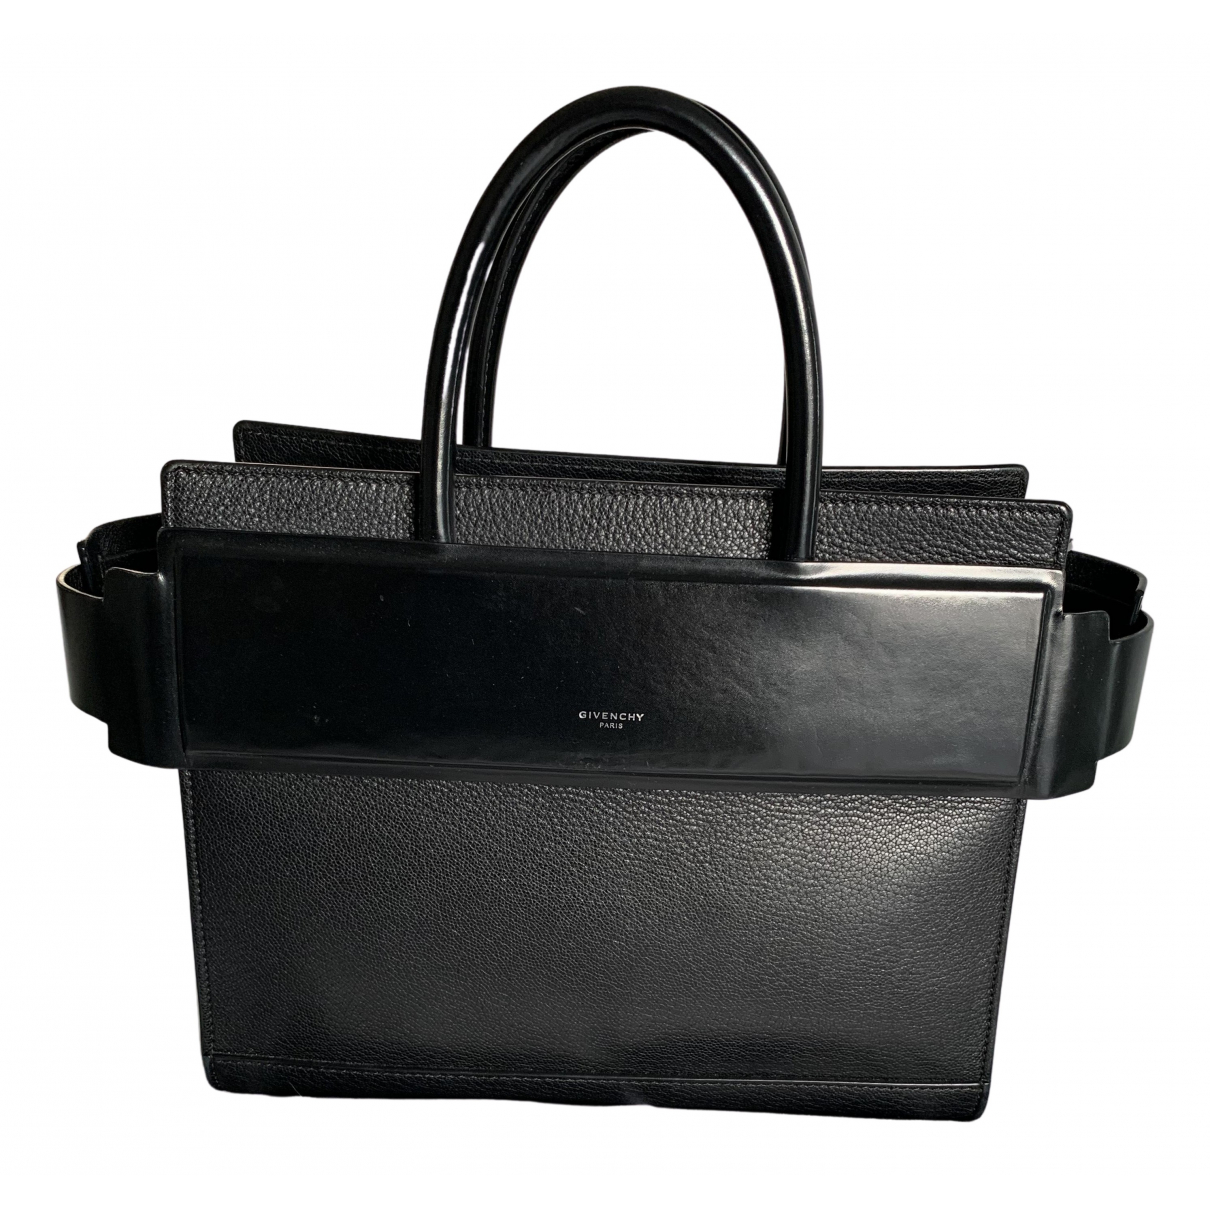 Givenchy Horizon Black Leather handbag for Women \N